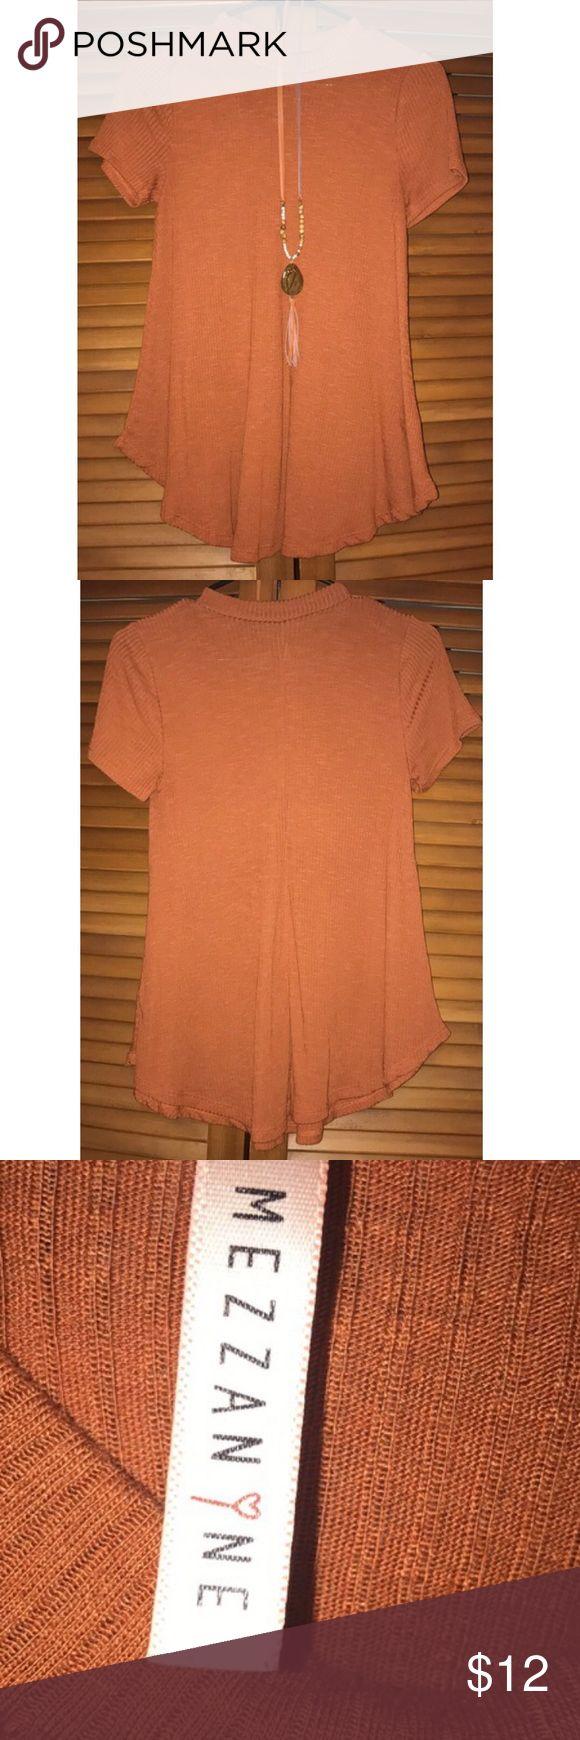 Burnt Orange Top soft burnt orange short sleeve top size small- fits medium easily too Tops Tees - Short Sleeve